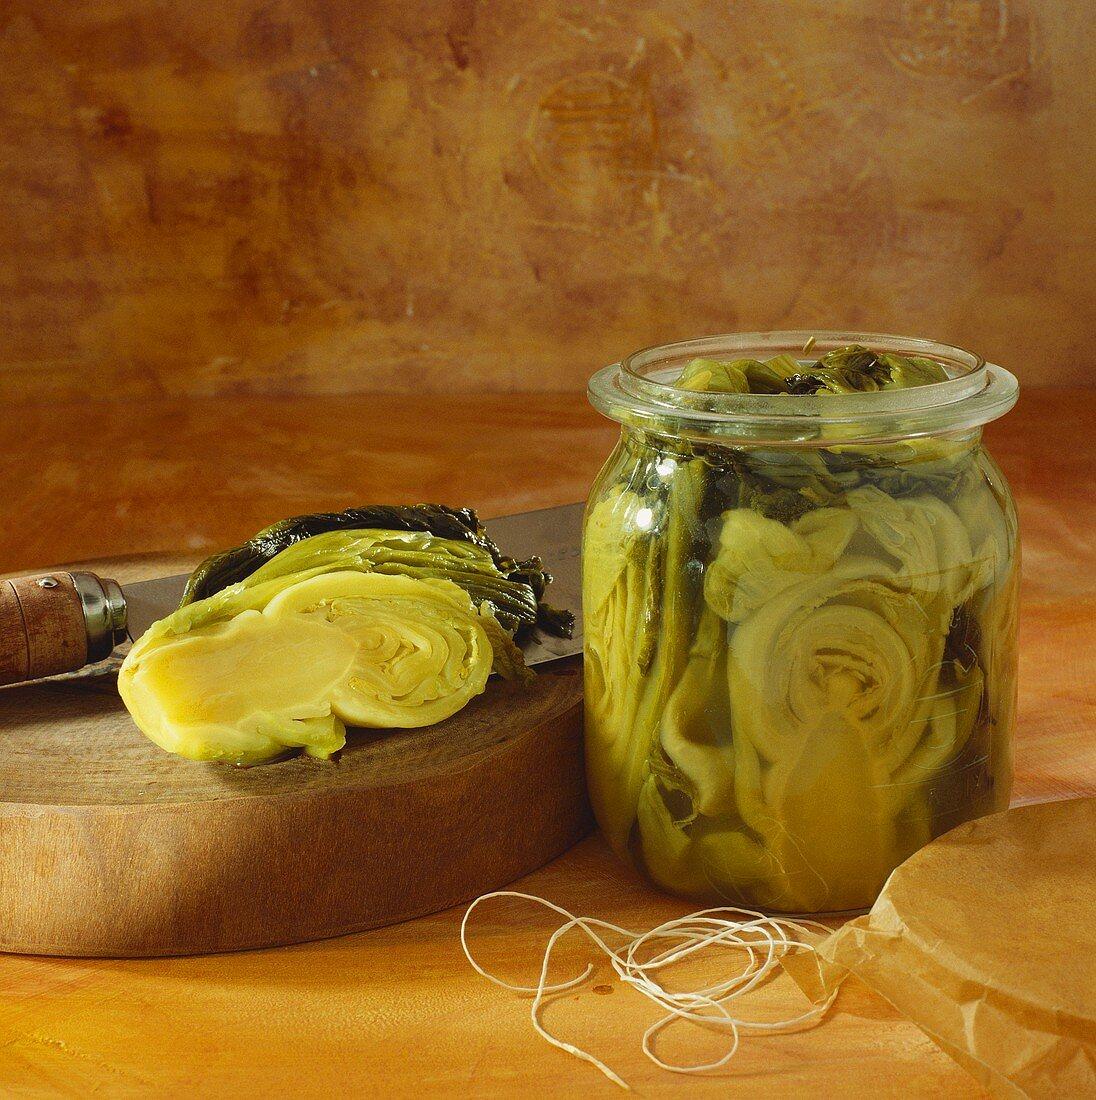 Chinese sauerkraut (pickled Chinese cabbage) in jar